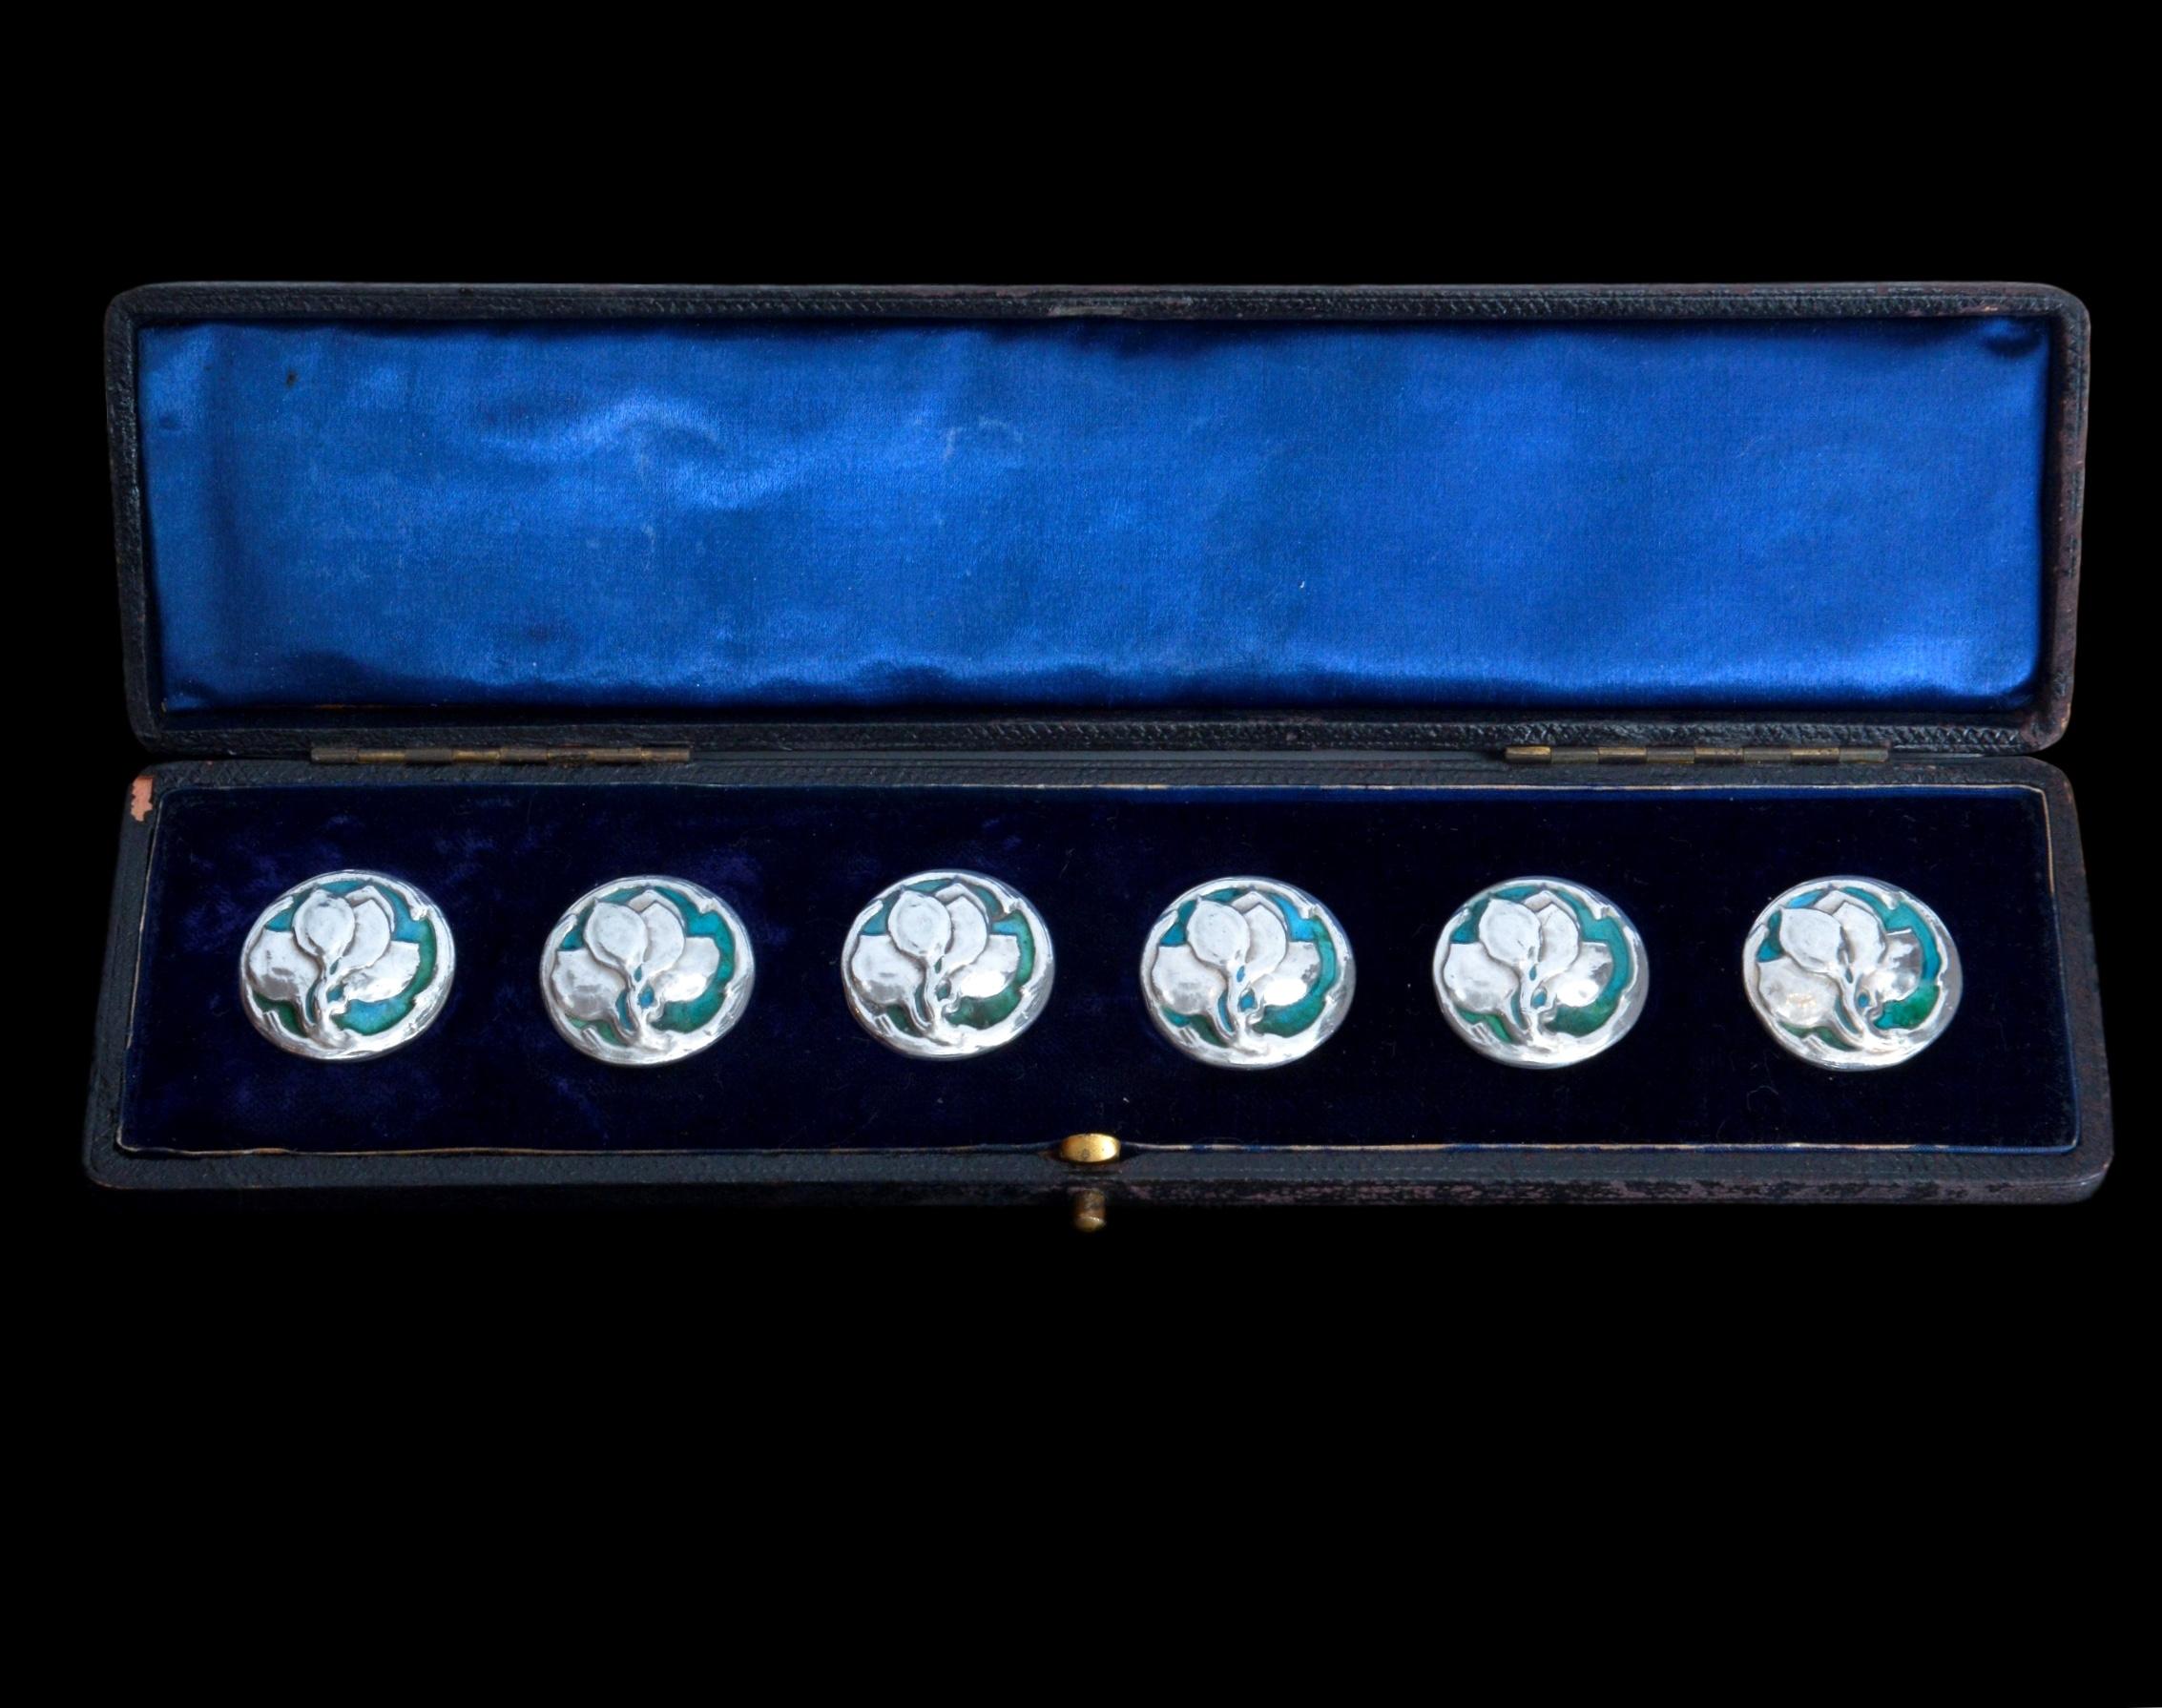 David veazey buttons, william hutton buttons